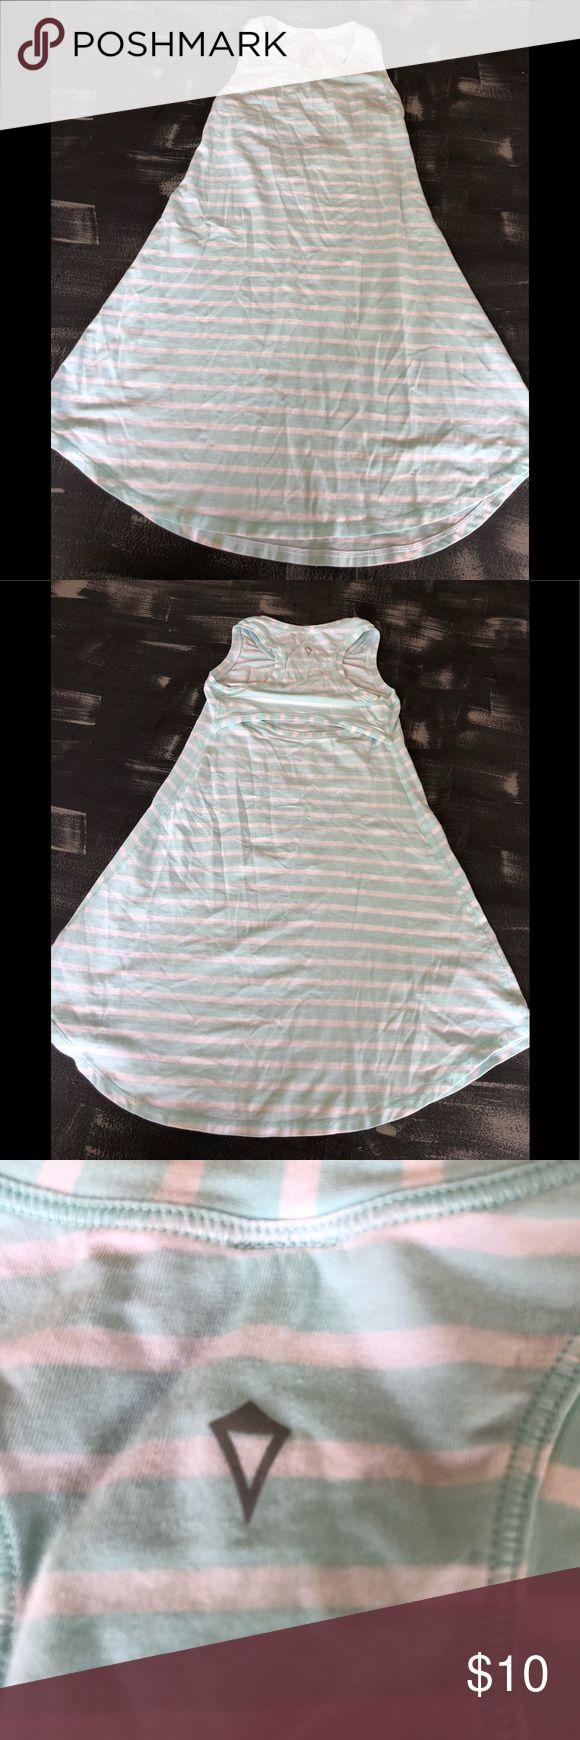 Ivivva by Lululemon Dress Size kids 7 Ivivva Dresses